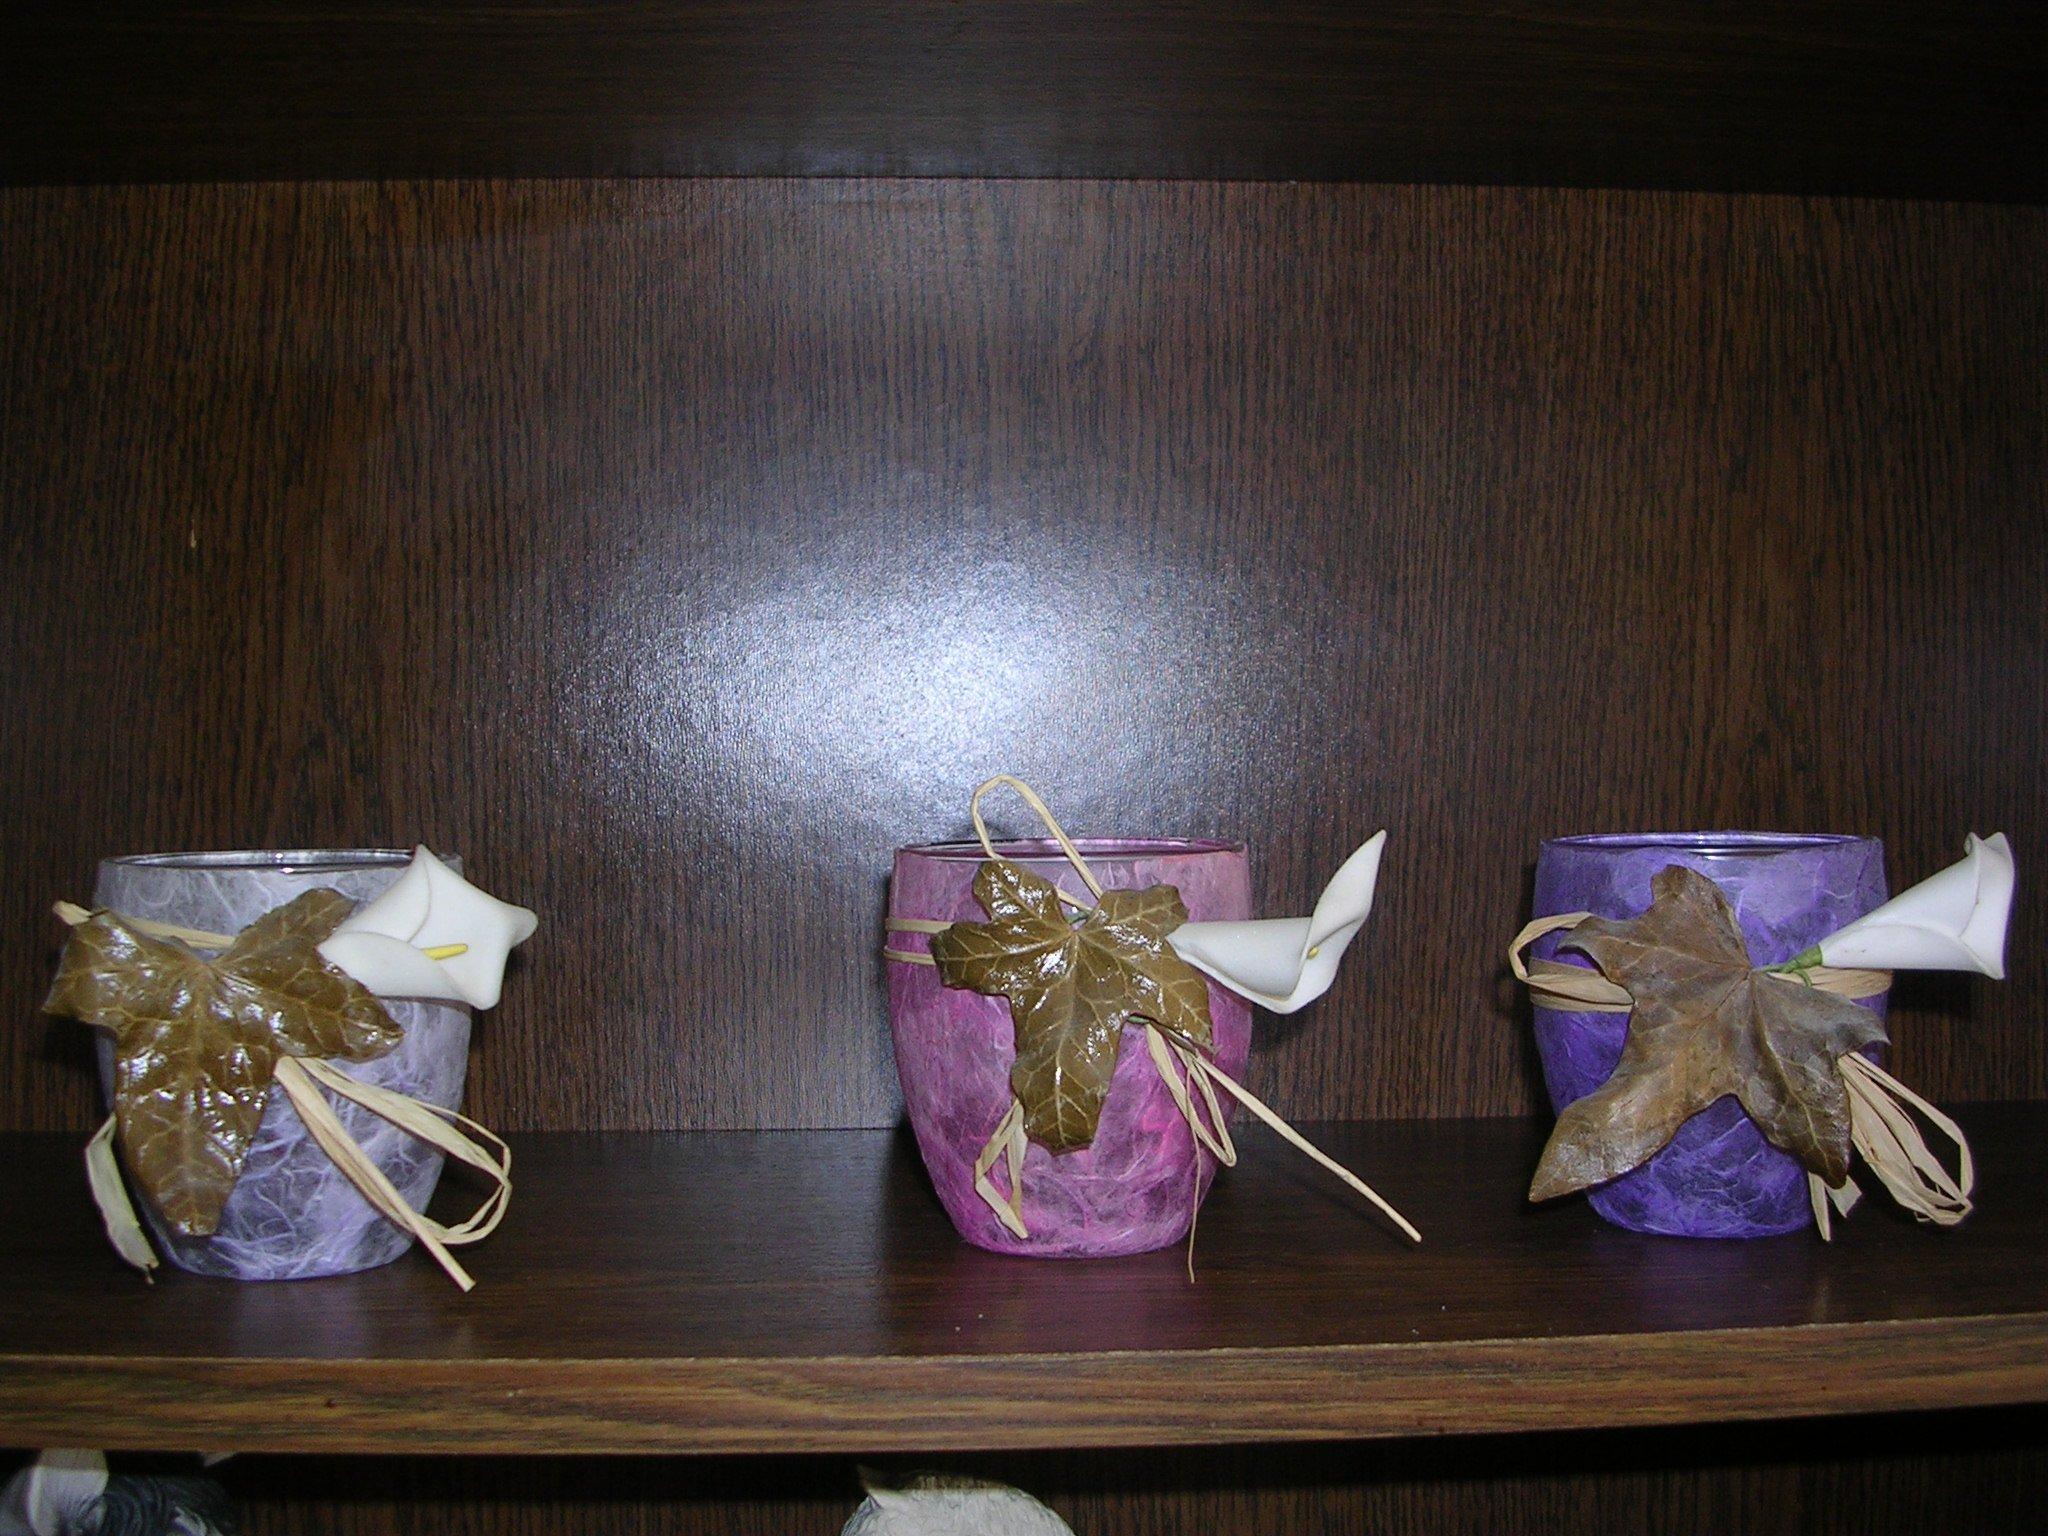 bougies cadeau pour les invit s mariage neska58 photos club doctissimo. Black Bedroom Furniture Sets. Home Design Ideas